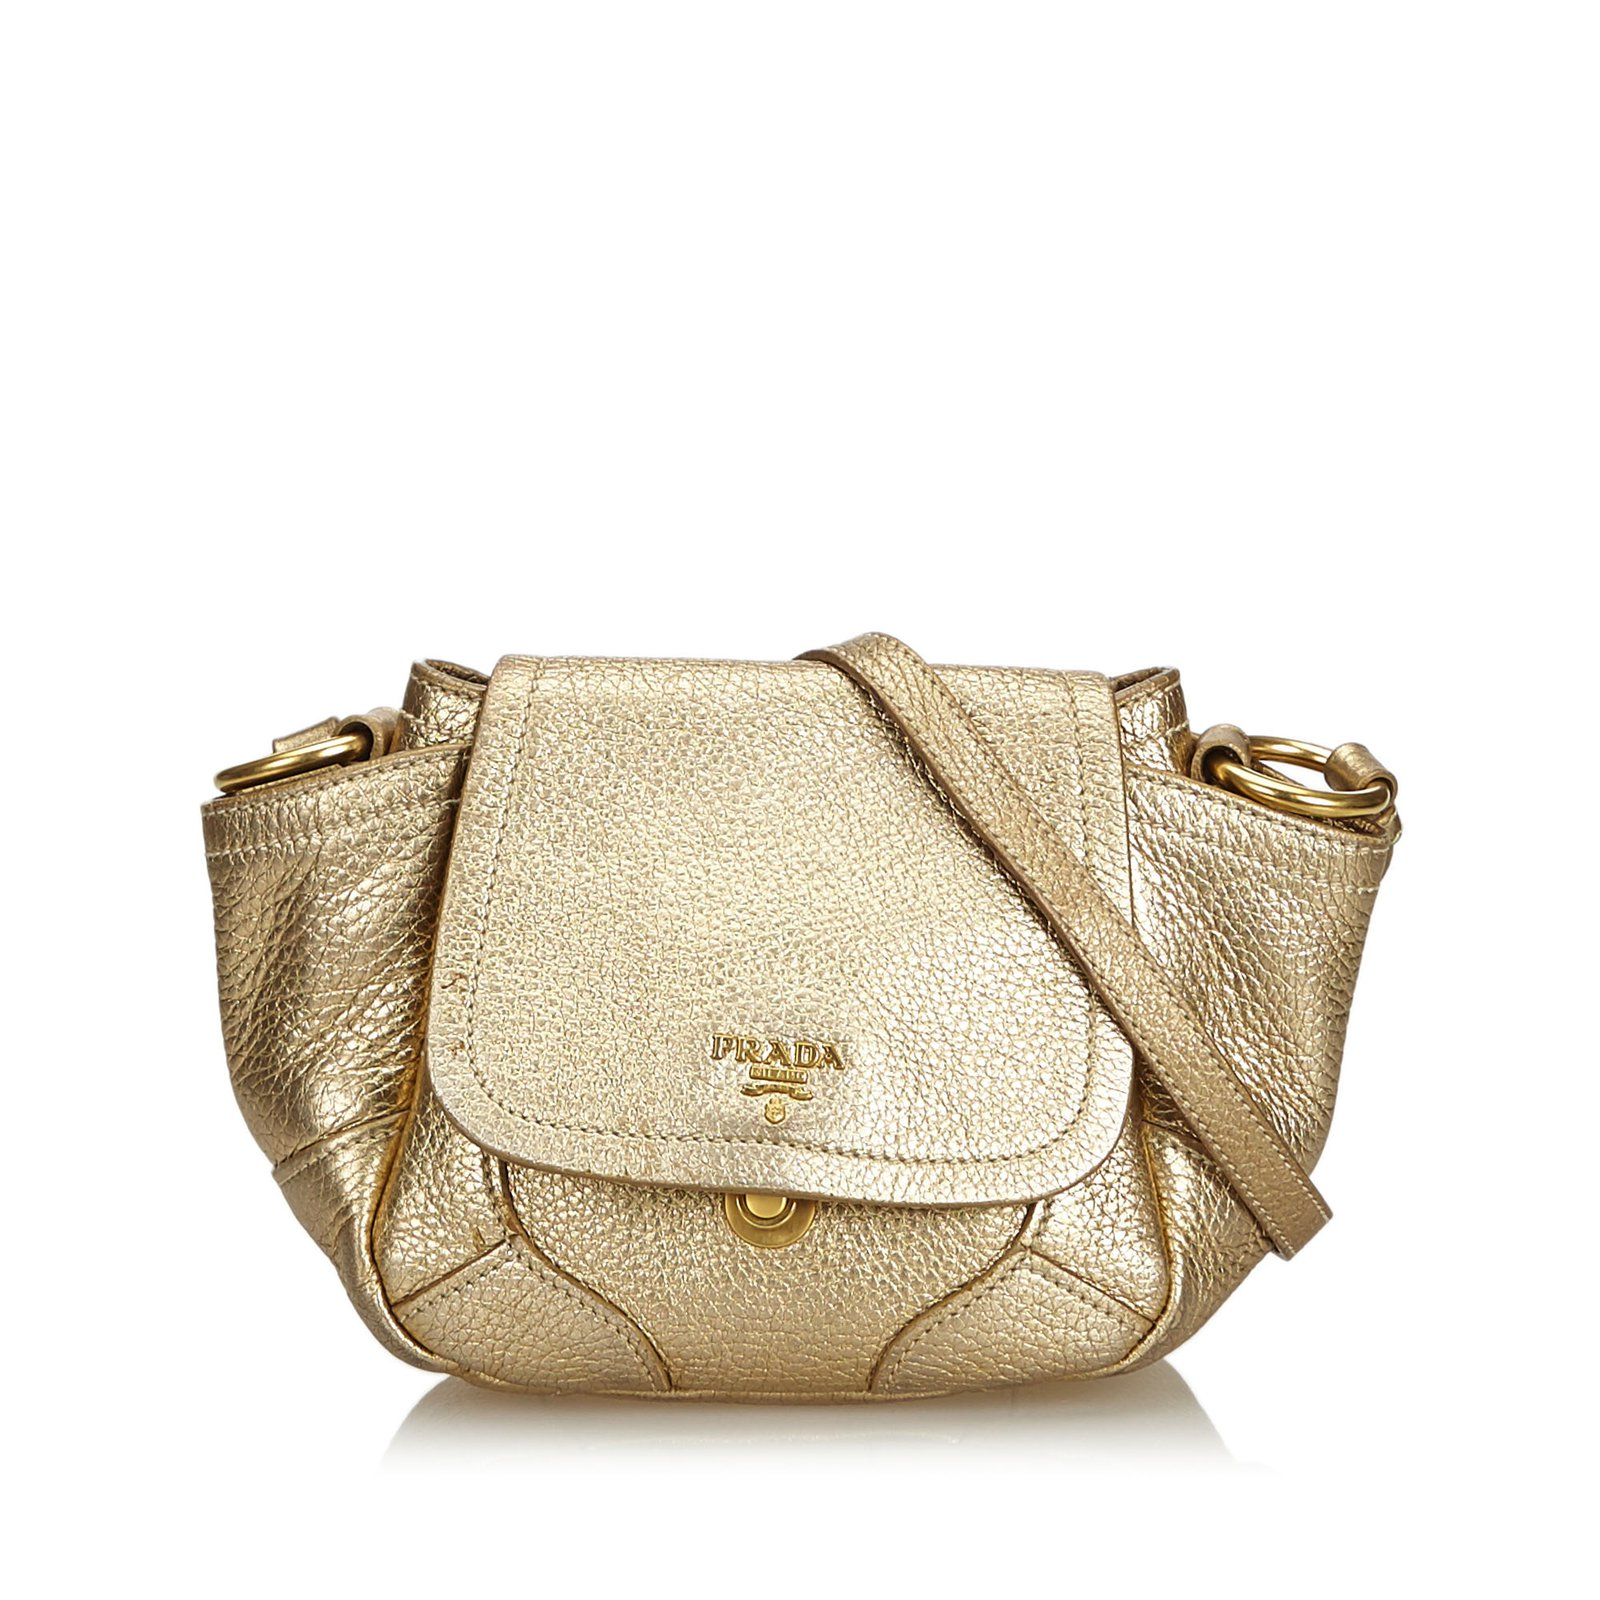 495bd64cf5b4 Prada Vitello Daino Bandoliera Crossbody Bag Handbags Leather,Other Golden  ref.106947